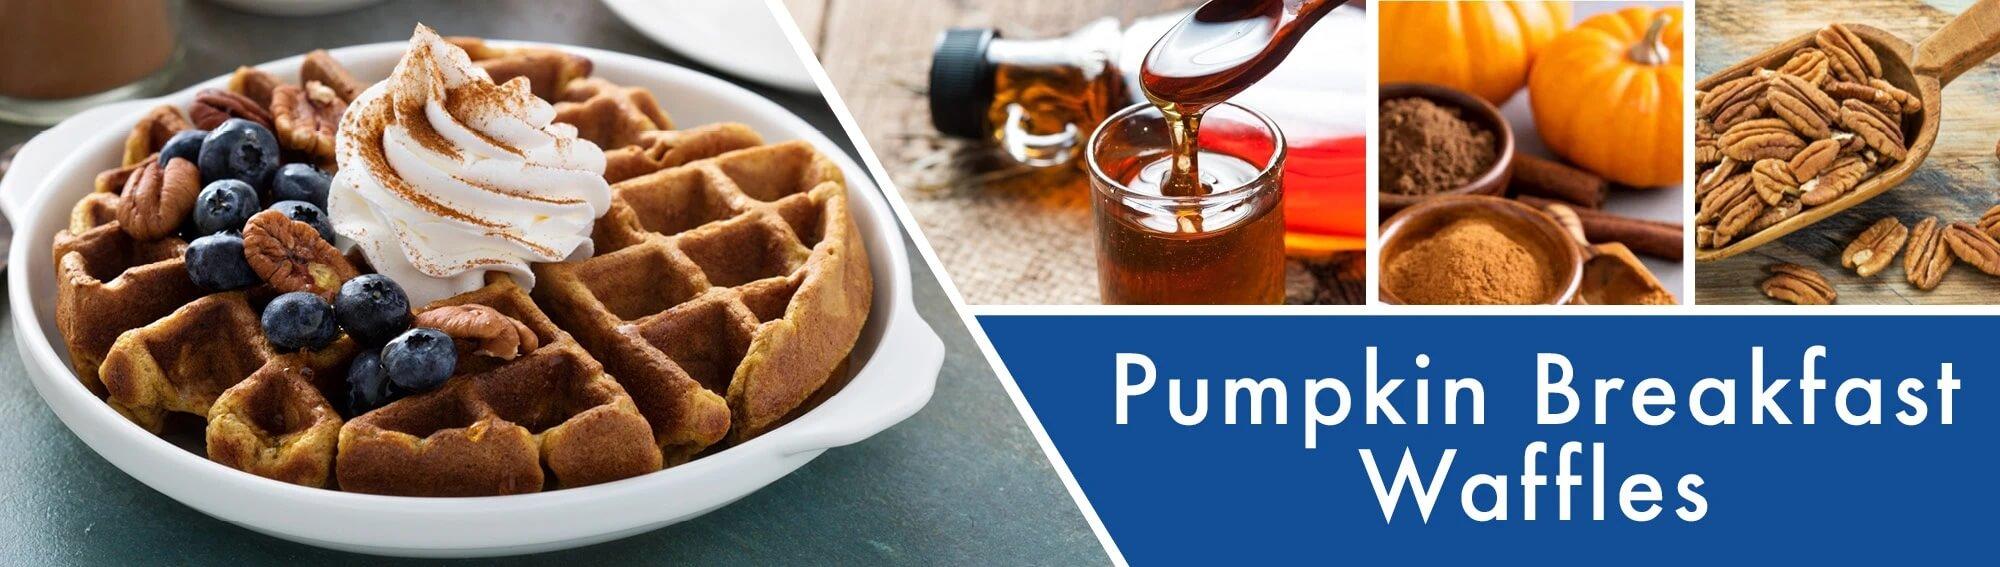 Pumpkin-Breakfast-Waffles-Banner